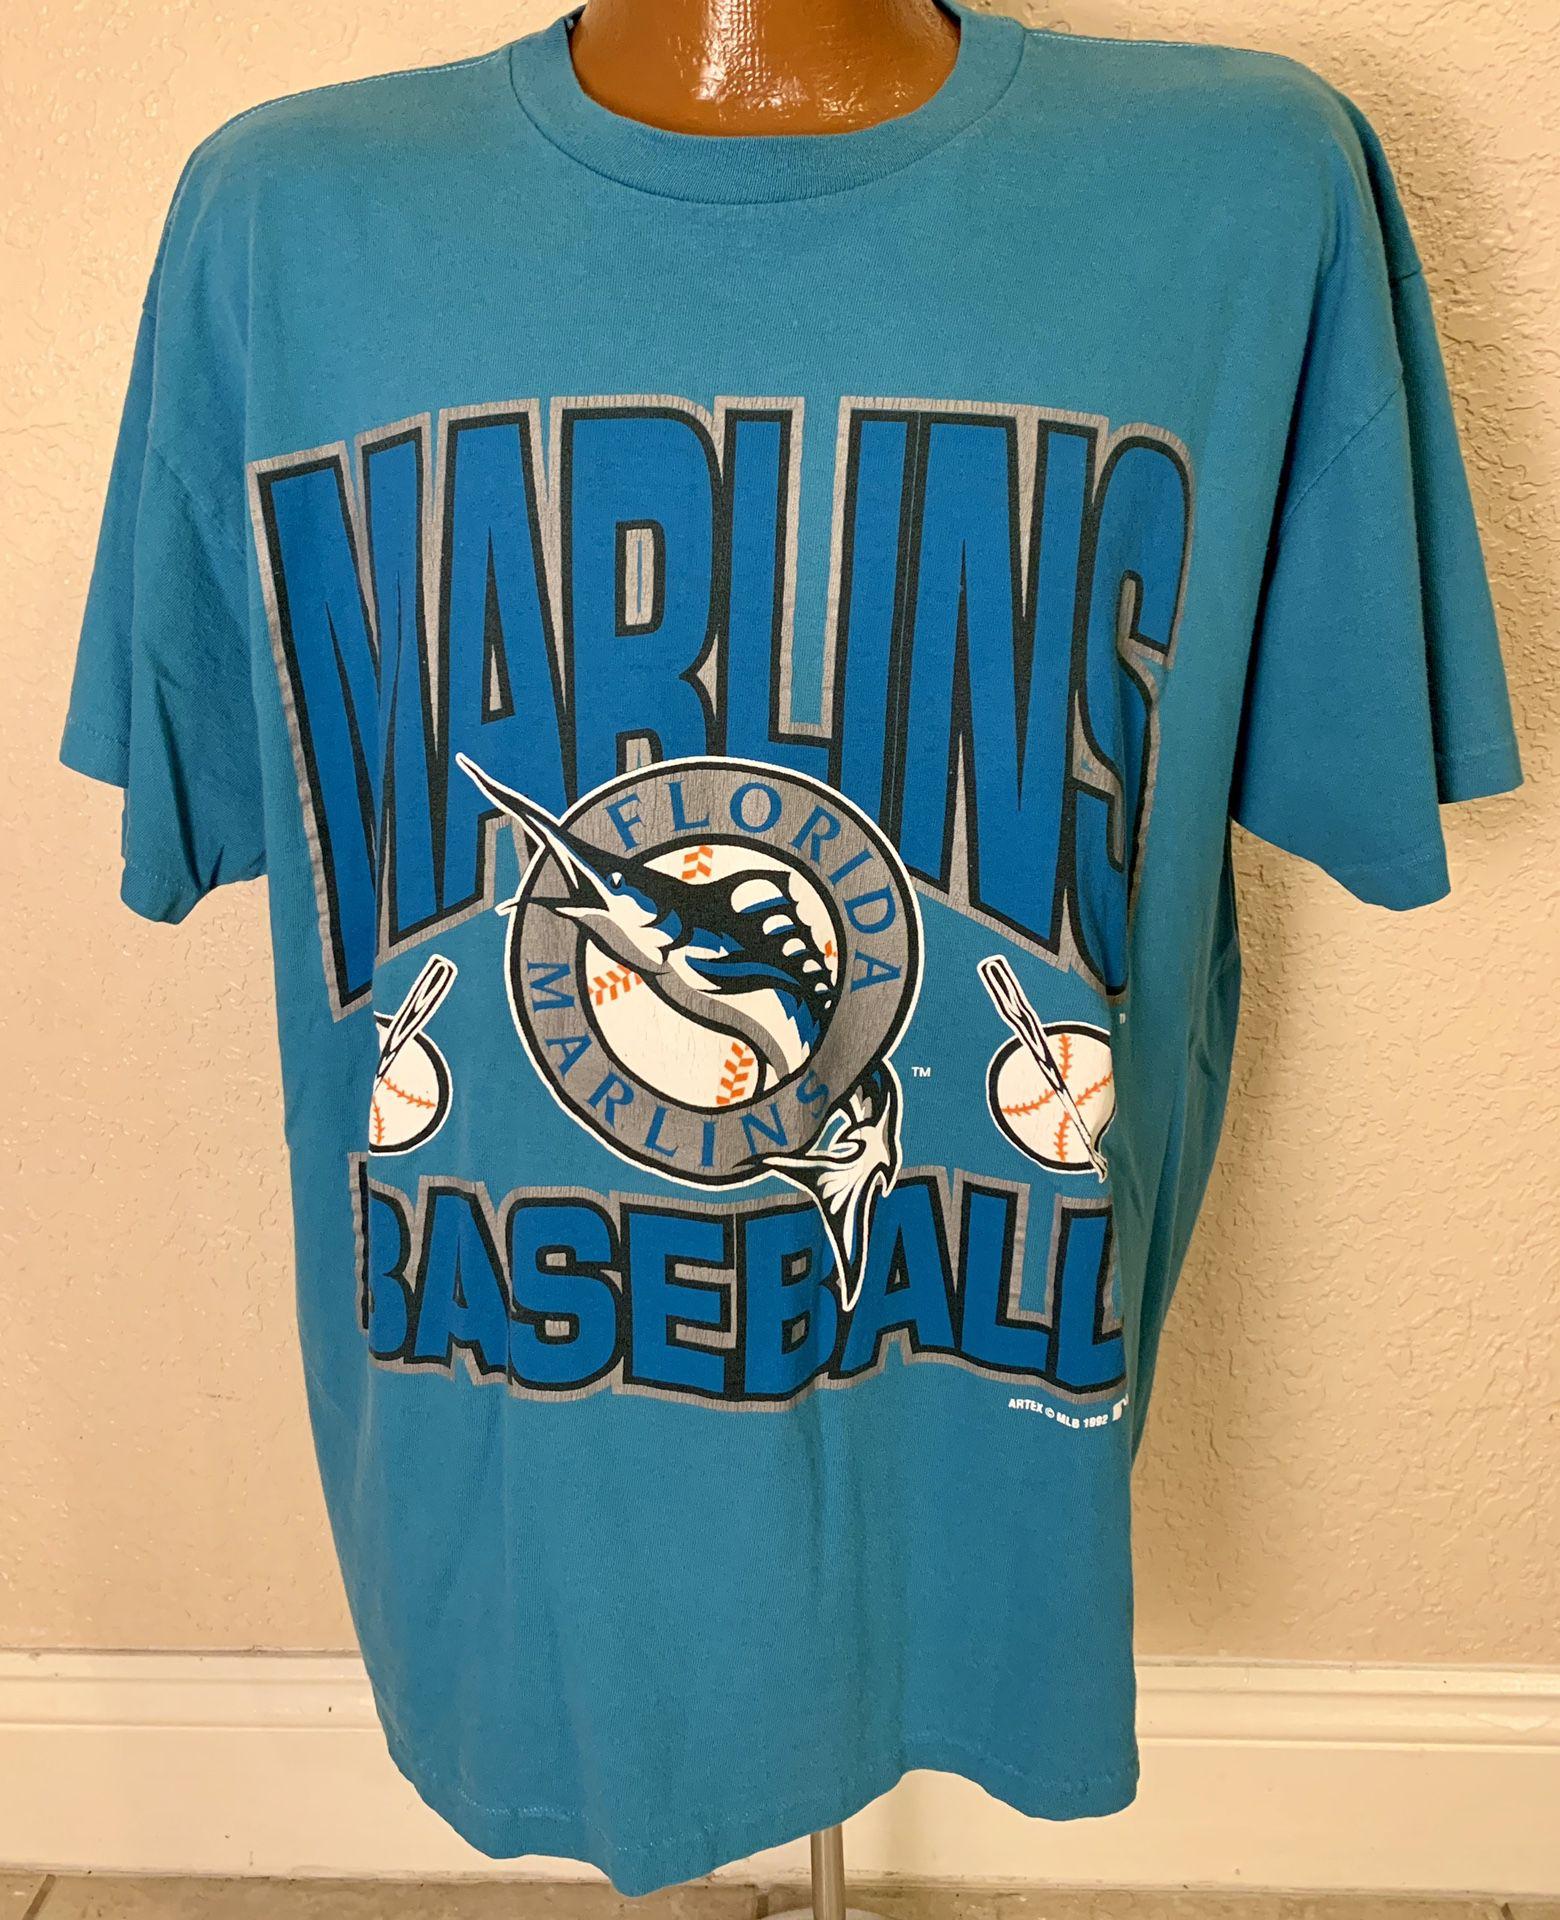 MLB. Vintage 1992 Florida Marlins Baseball Single Stitch T-shirt. Size XL (Fits LG). Good condition. See pics.